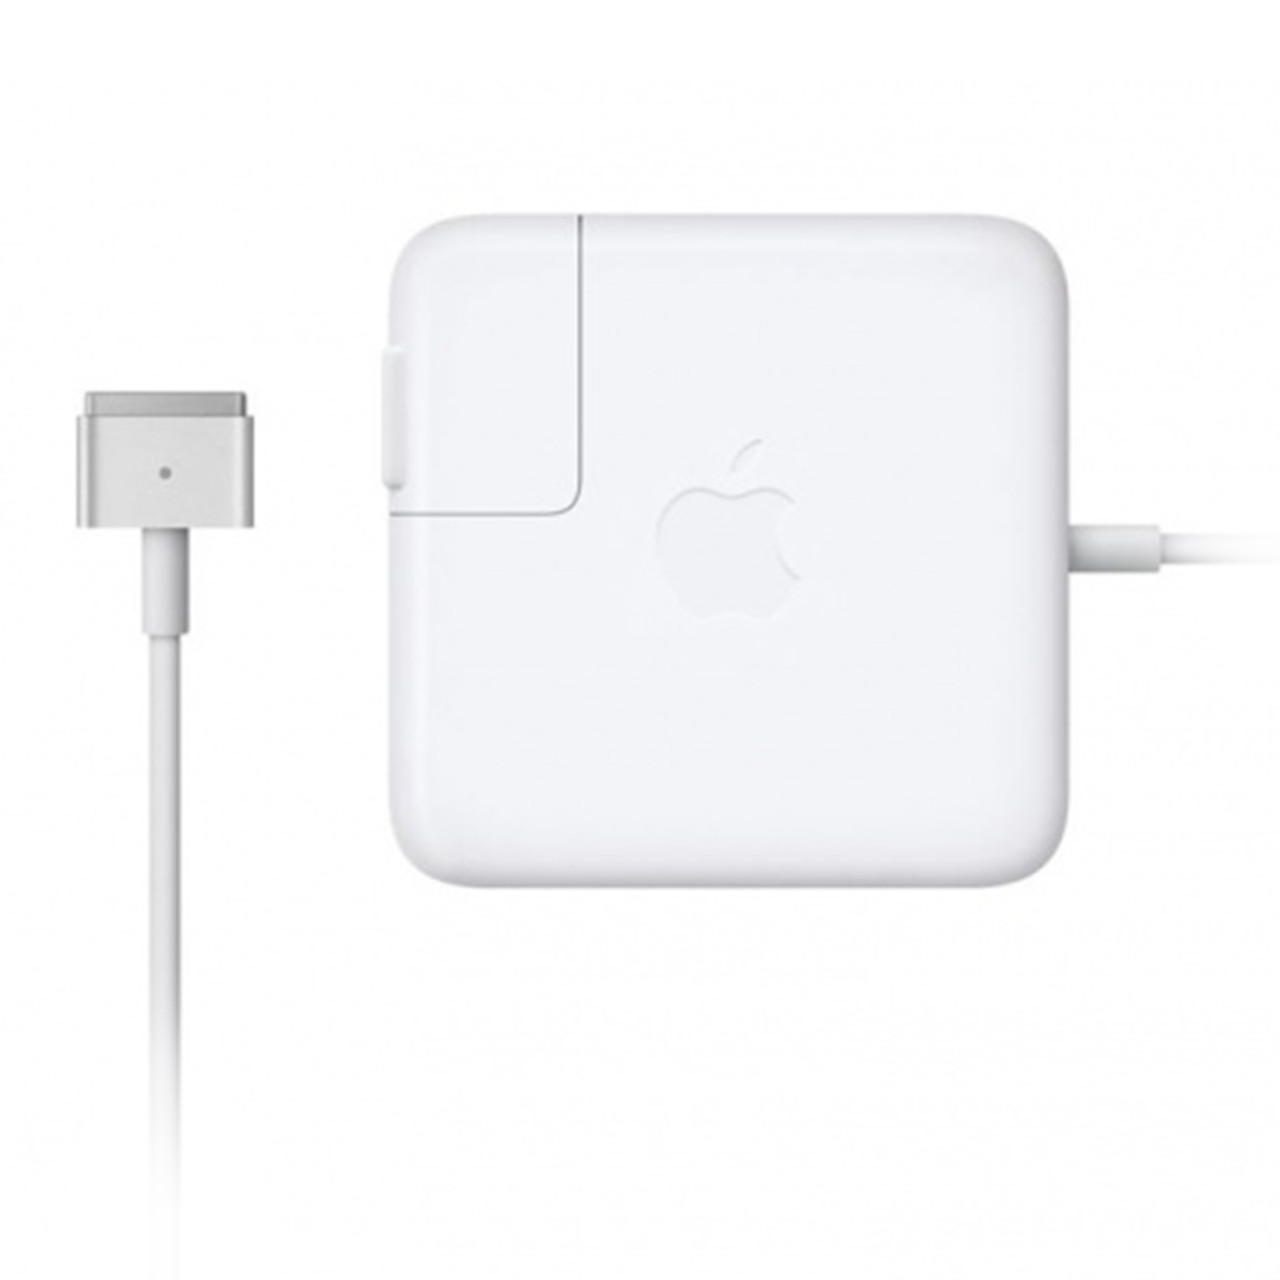 СЗУ Apple MagSafe for MacBook 2-Gen(T-Shape)/85W//MFI:MD506Z/A - Original